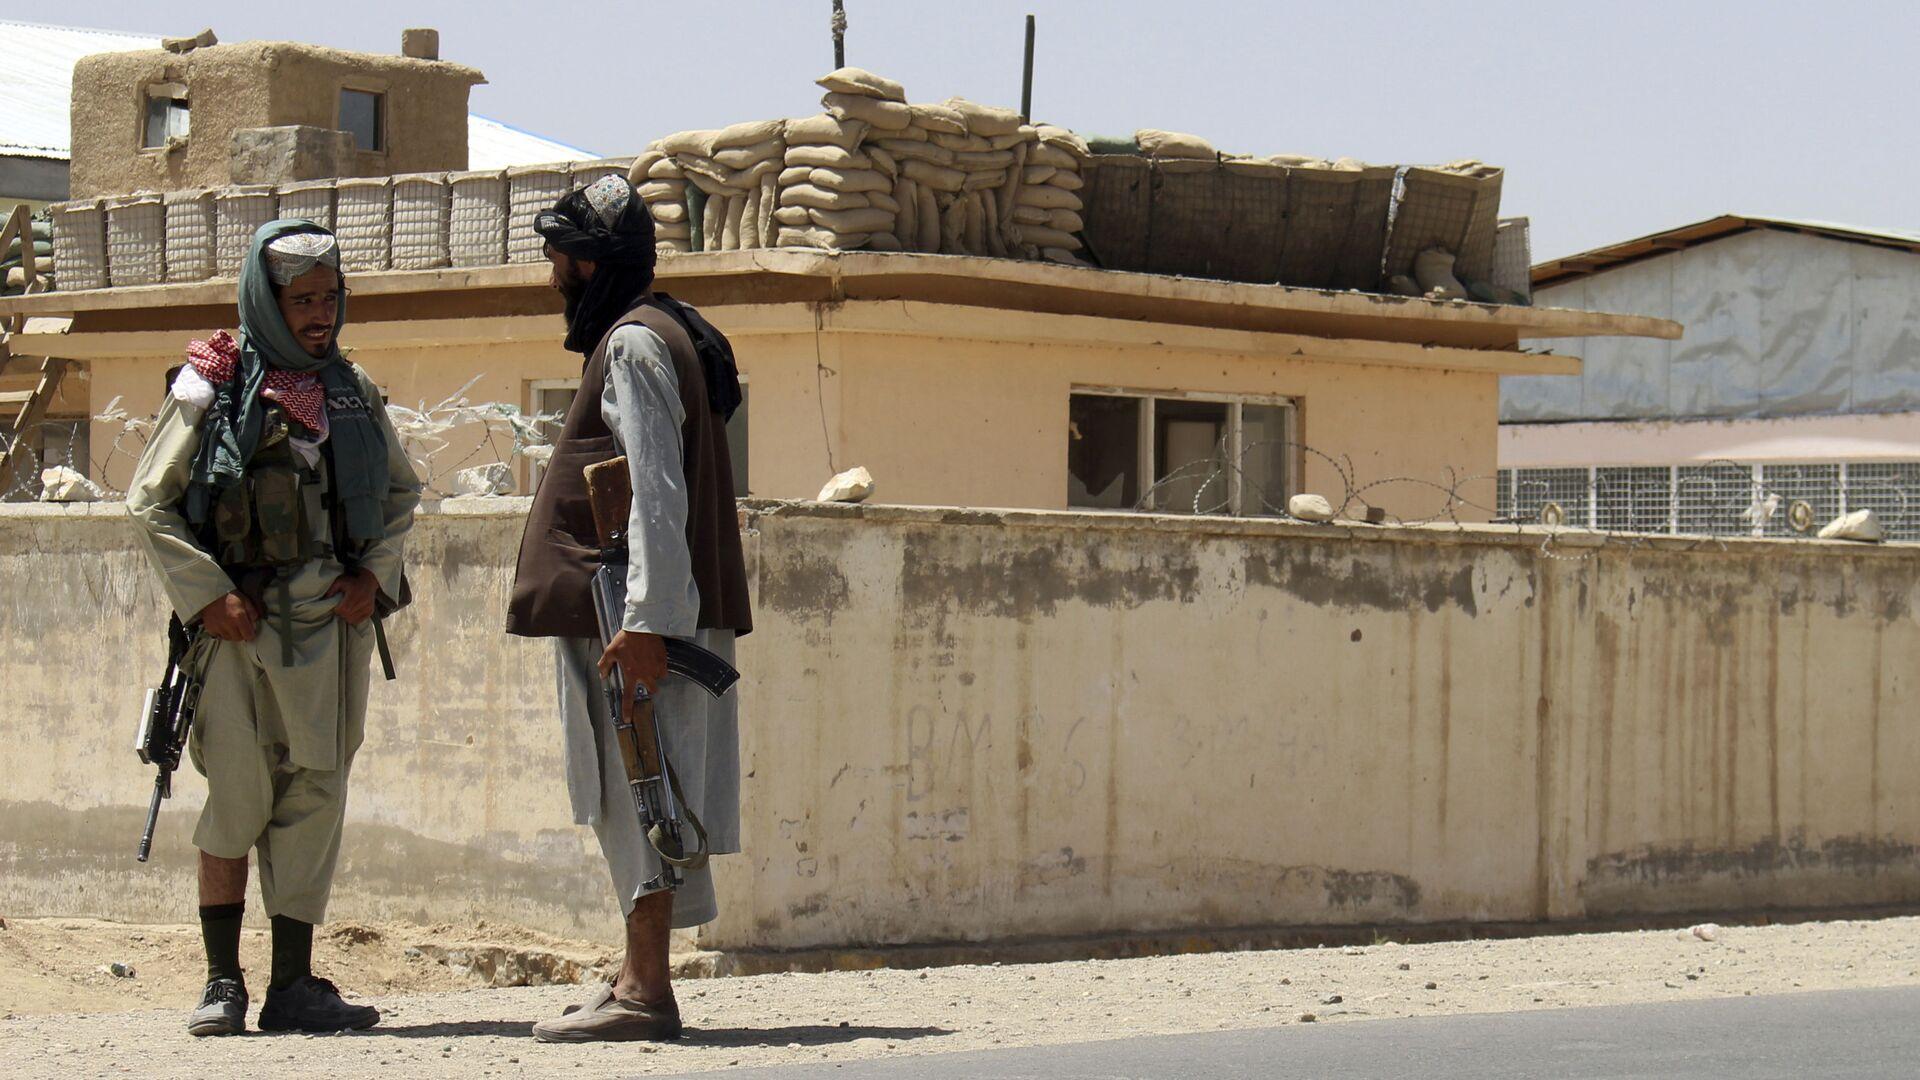 Боевики Талибана* в городе Газни, Афганистан - Sputnik Узбекистан, 1920, 31.08.2021